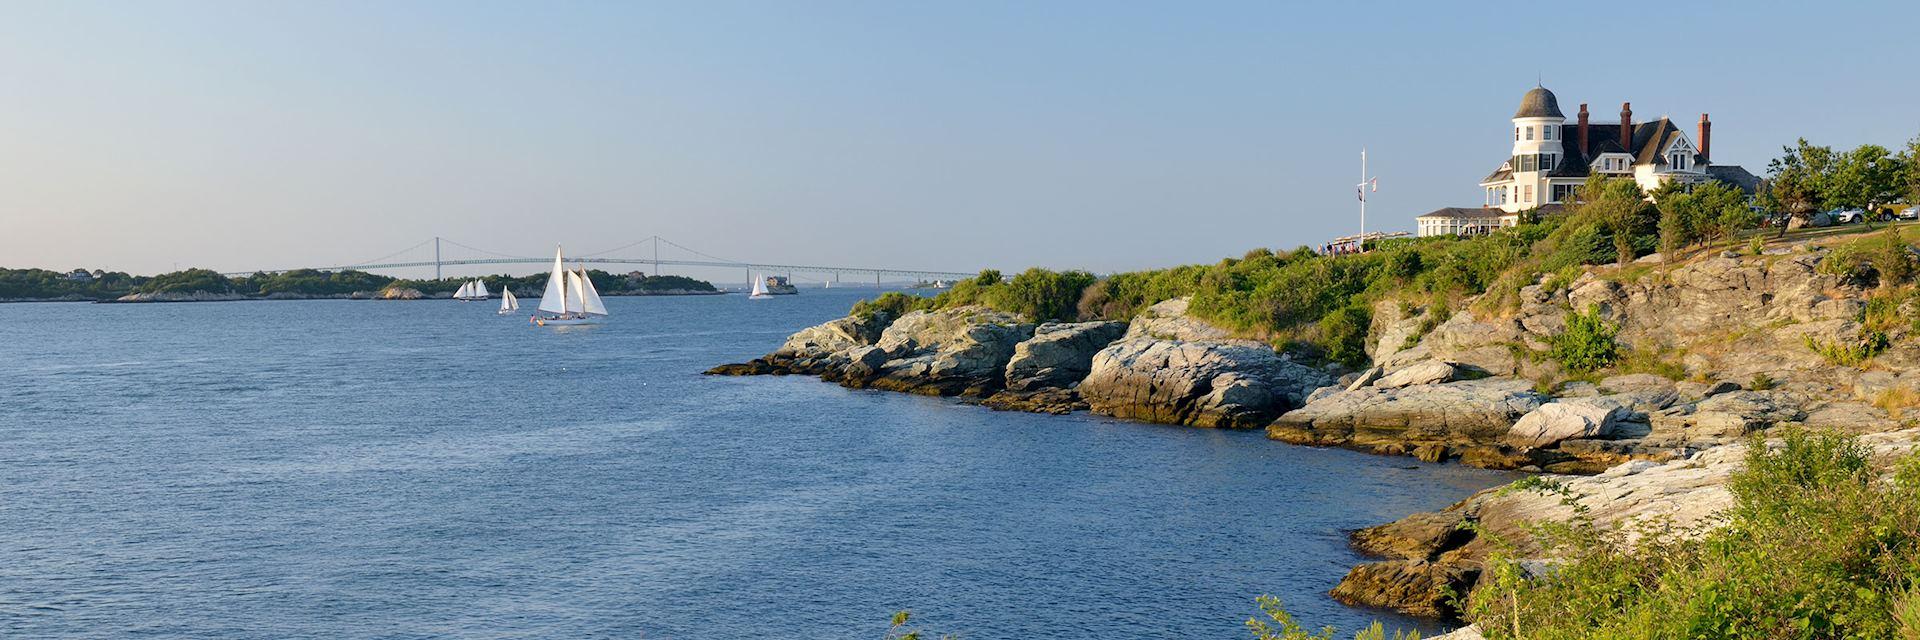 Newport, Rhode Island, New England